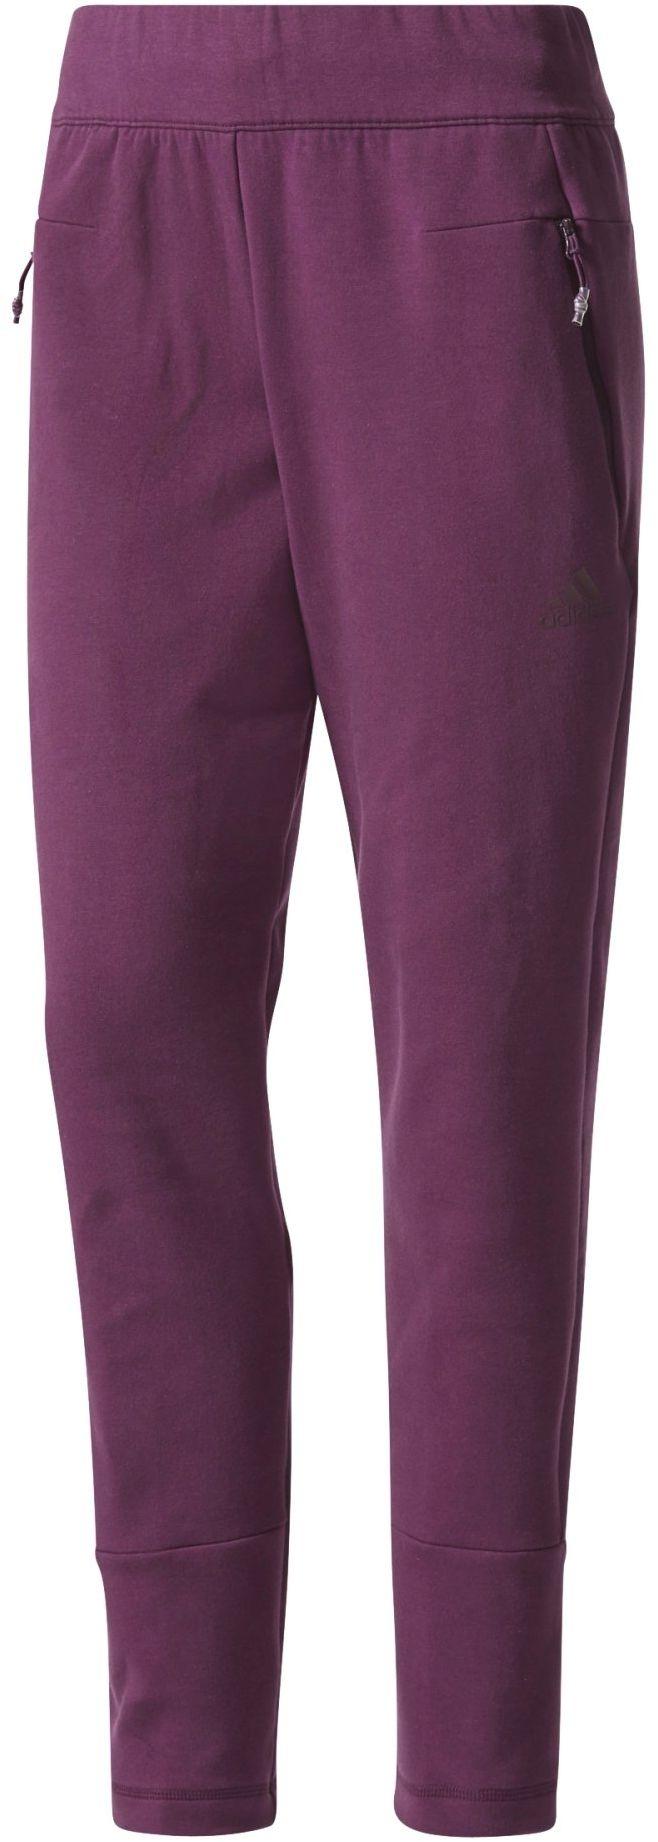 adidas Damskie spodnie Zne Slim Violet (Red Night) 2X-Small/Large